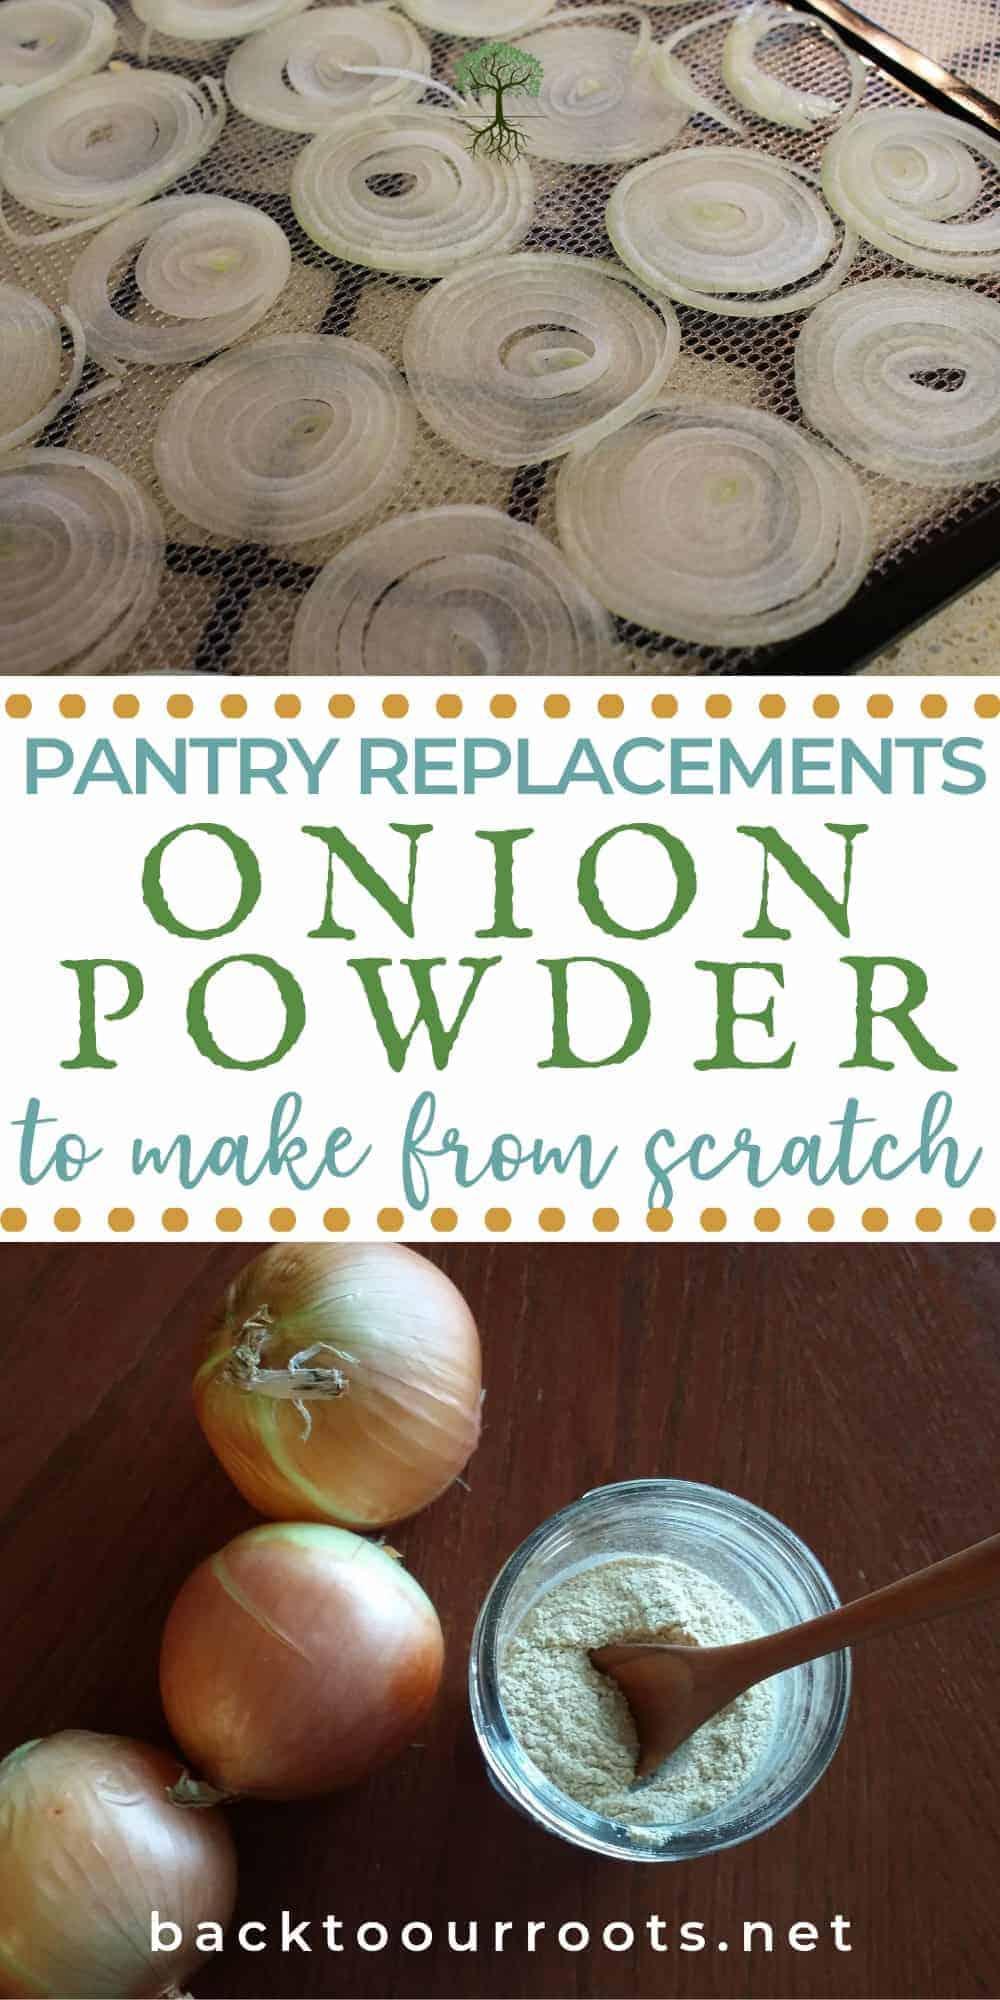 How to Make Homemade Onion Powder